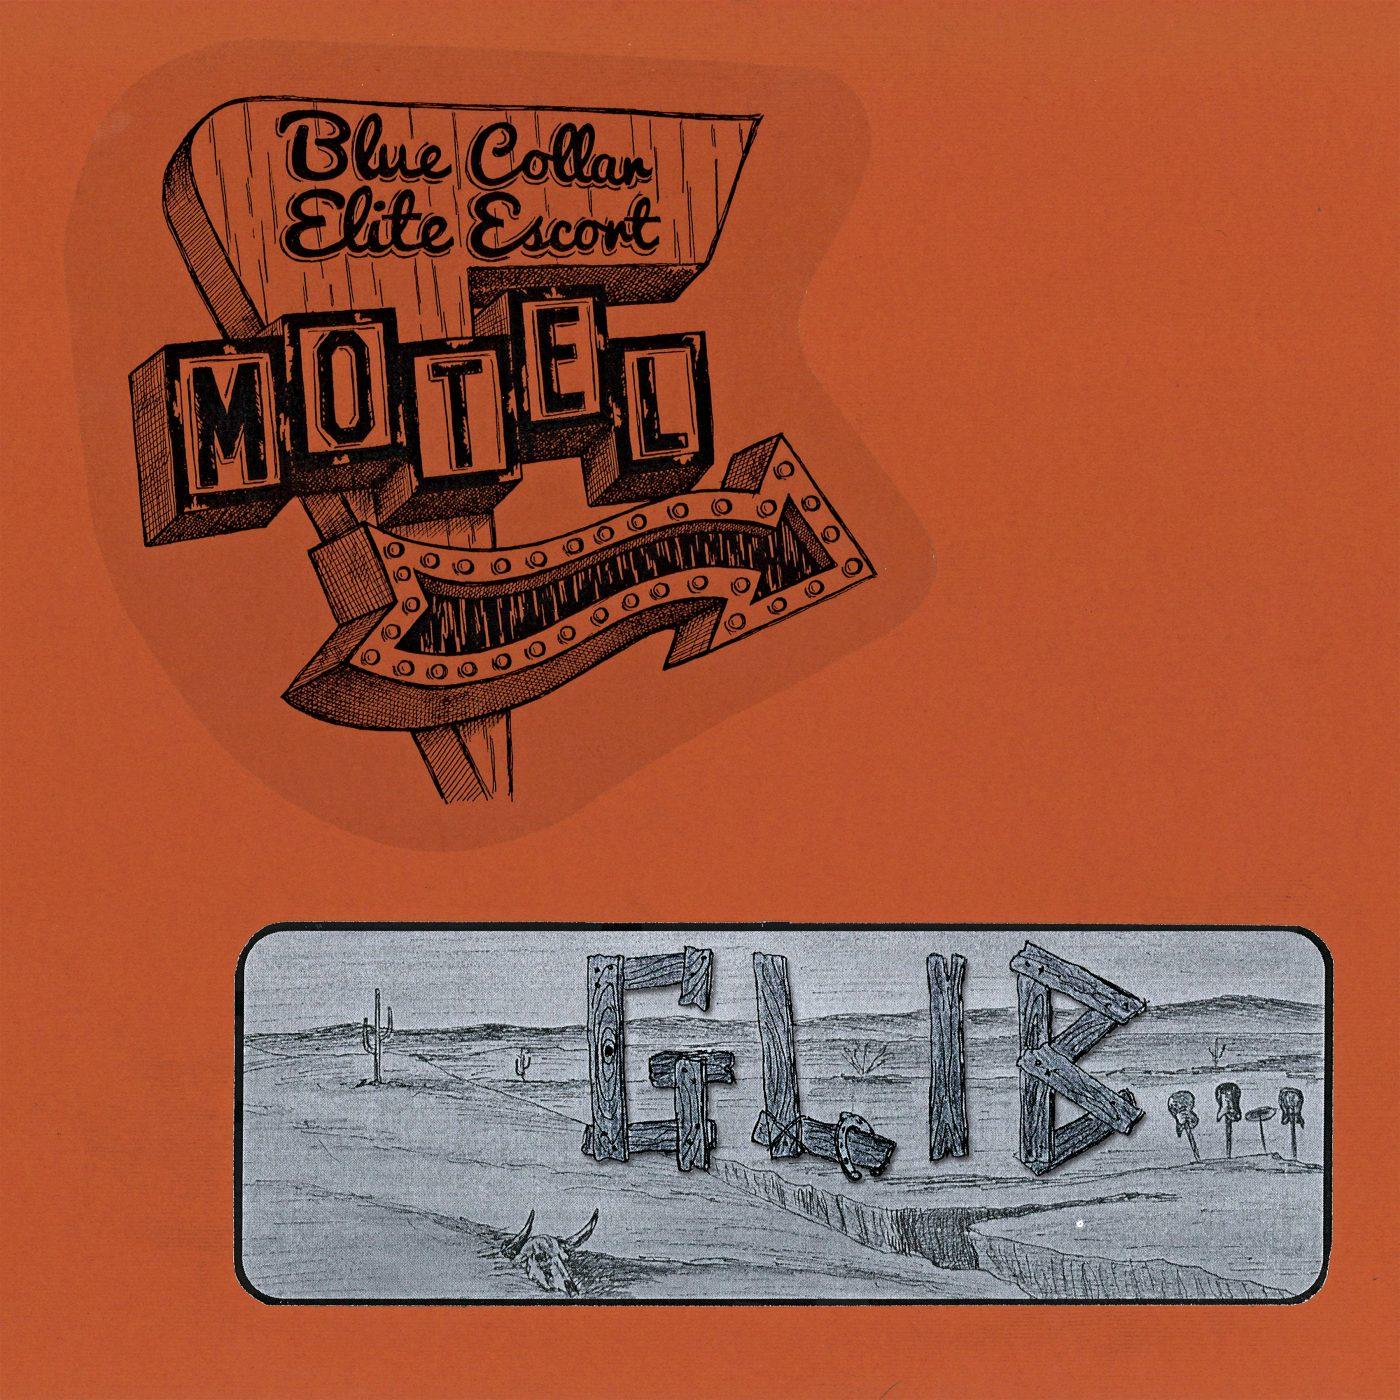 GLIB Blue collar elite escort motel